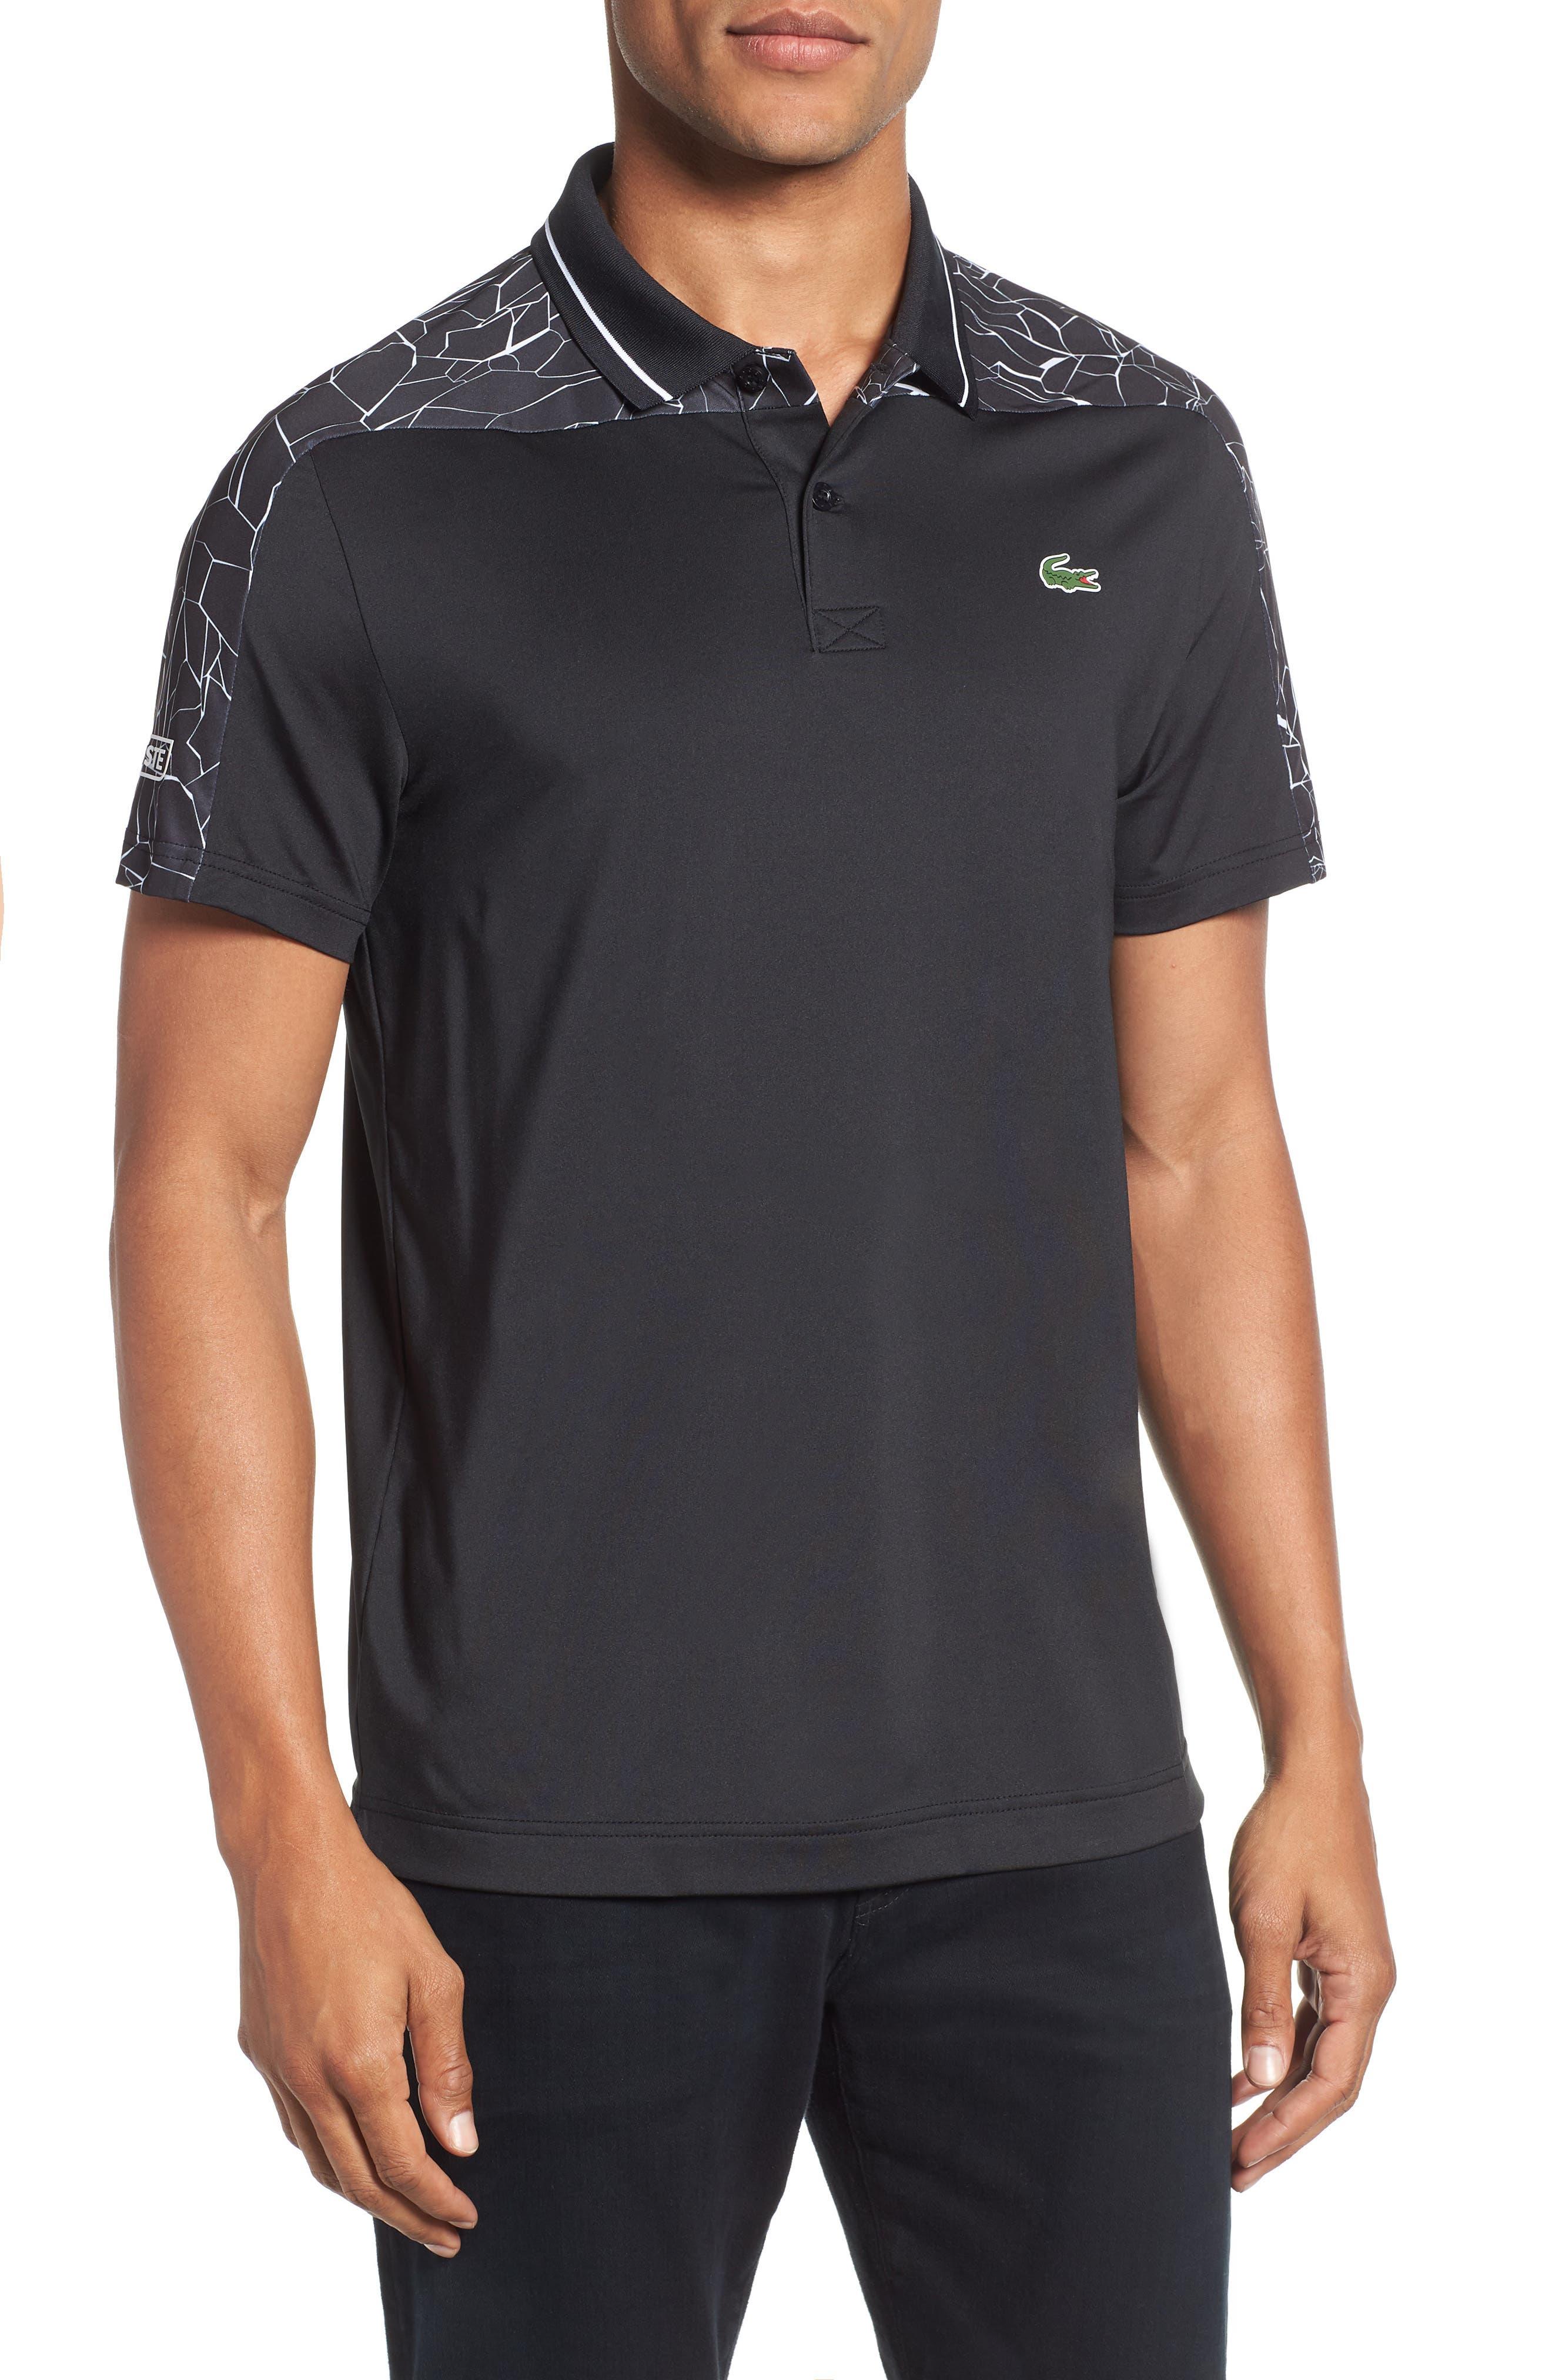 Regular Fit Novak Djokovic Ultra Dry Polo,                         Main,                         color, BLACK/ WHITE